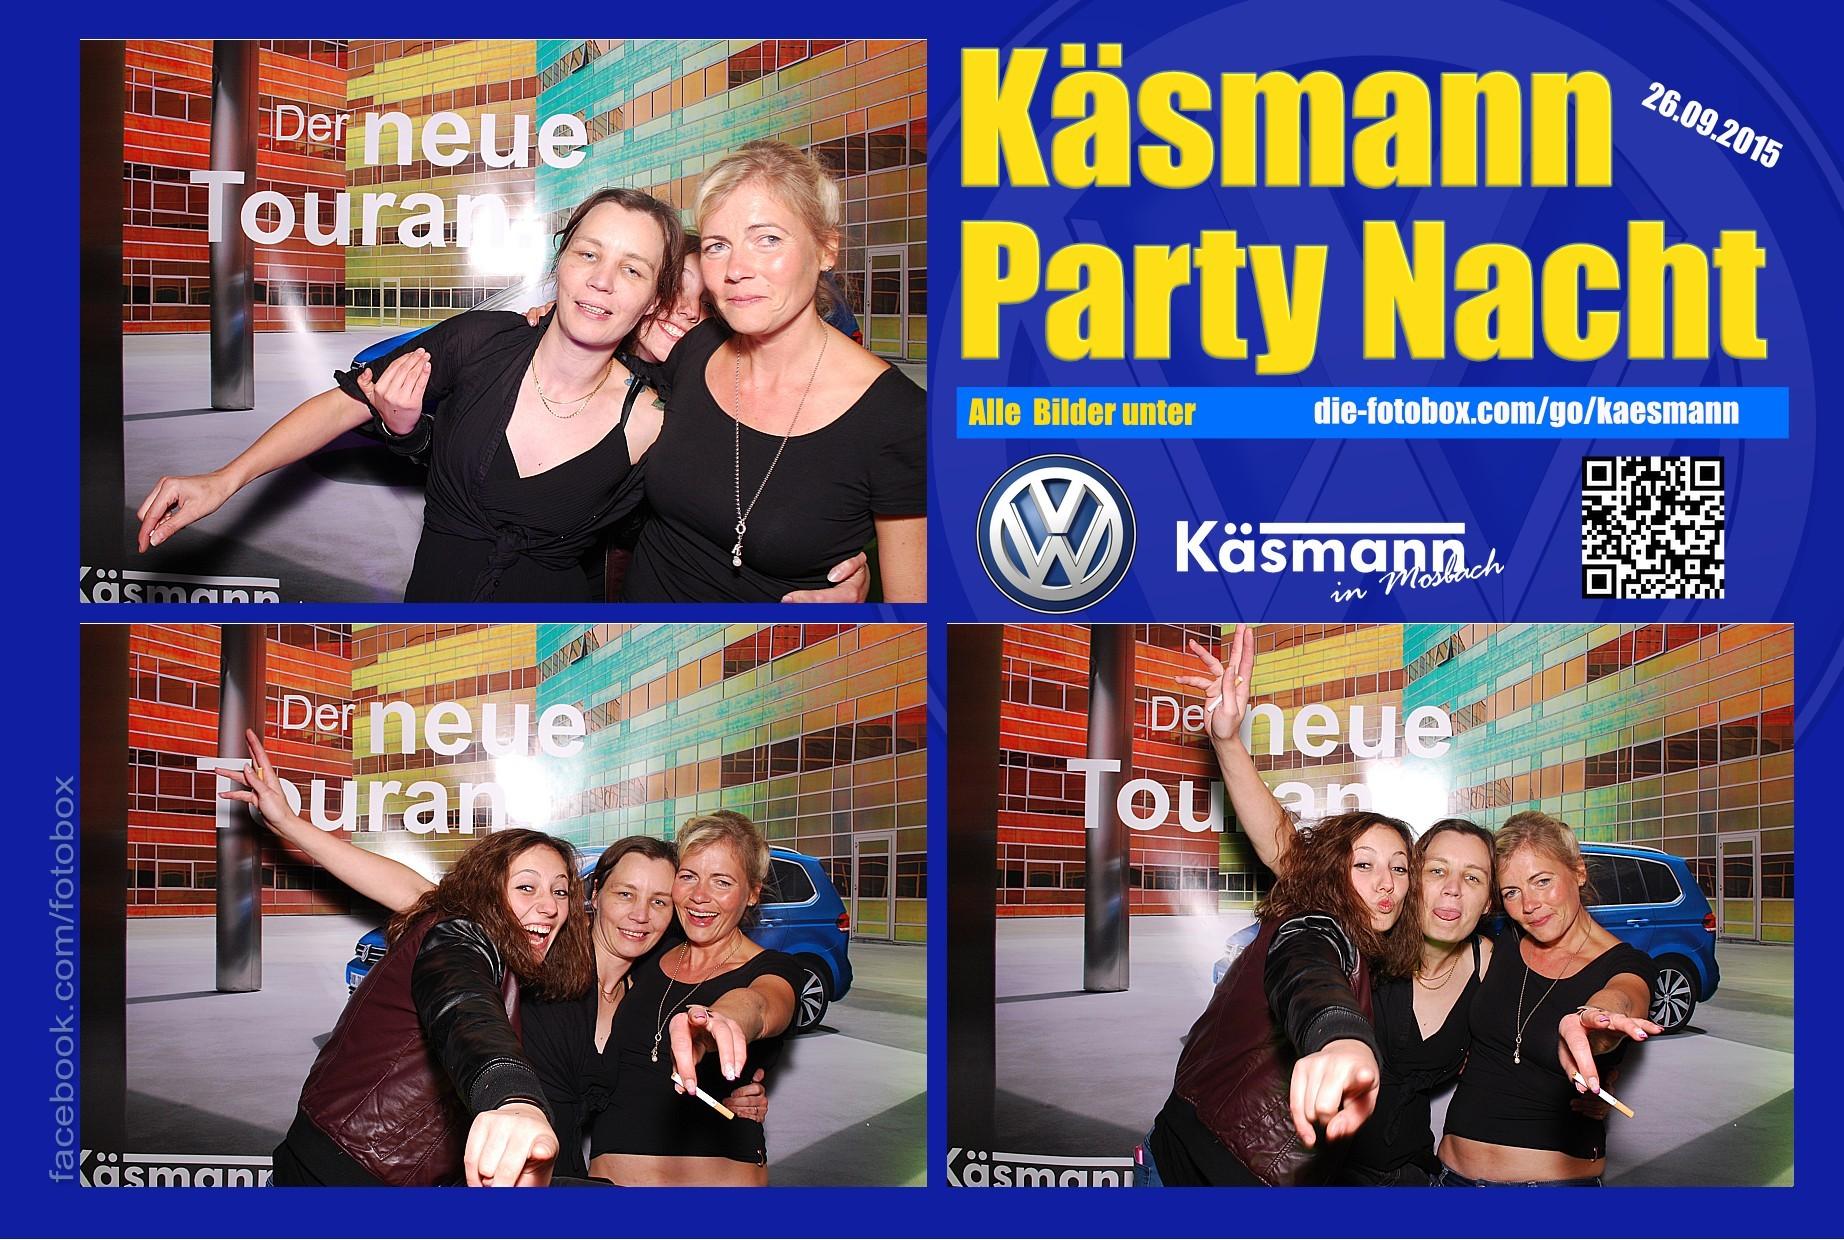 Käsmannparty 2015 - www.die-fotobox.com 01356